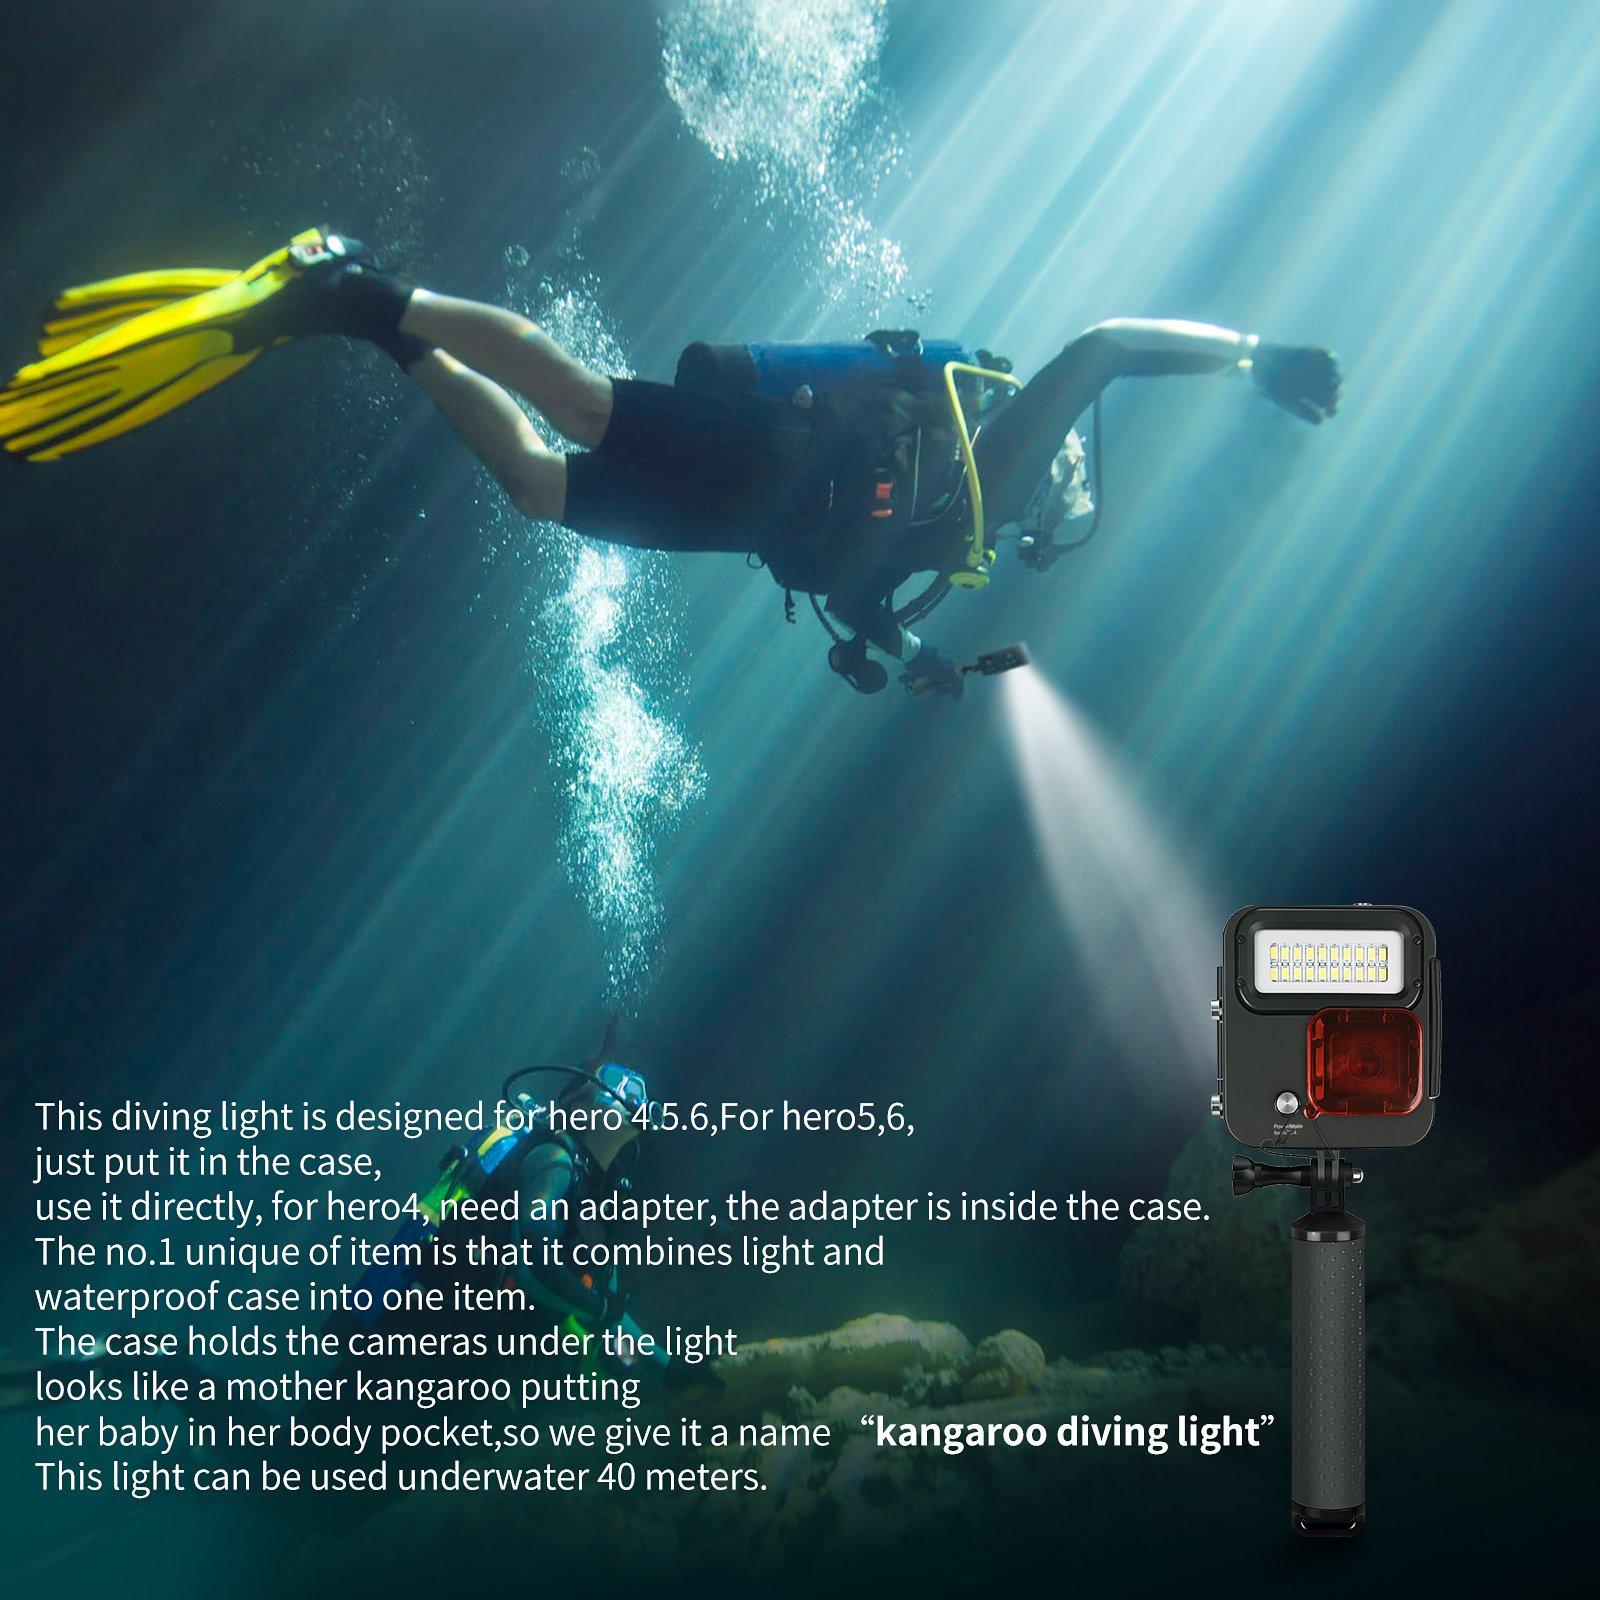 SHOOT 1000LM Kangaroo Diving Light for GoPro HERO7 Black/HERO6/HERO5/HERO4/HERO(2018),Waterproof Case 30m (98 feet), LED Underwater Scuba Fill Light,Removeble Red Filter by SHOOT (Image #4)